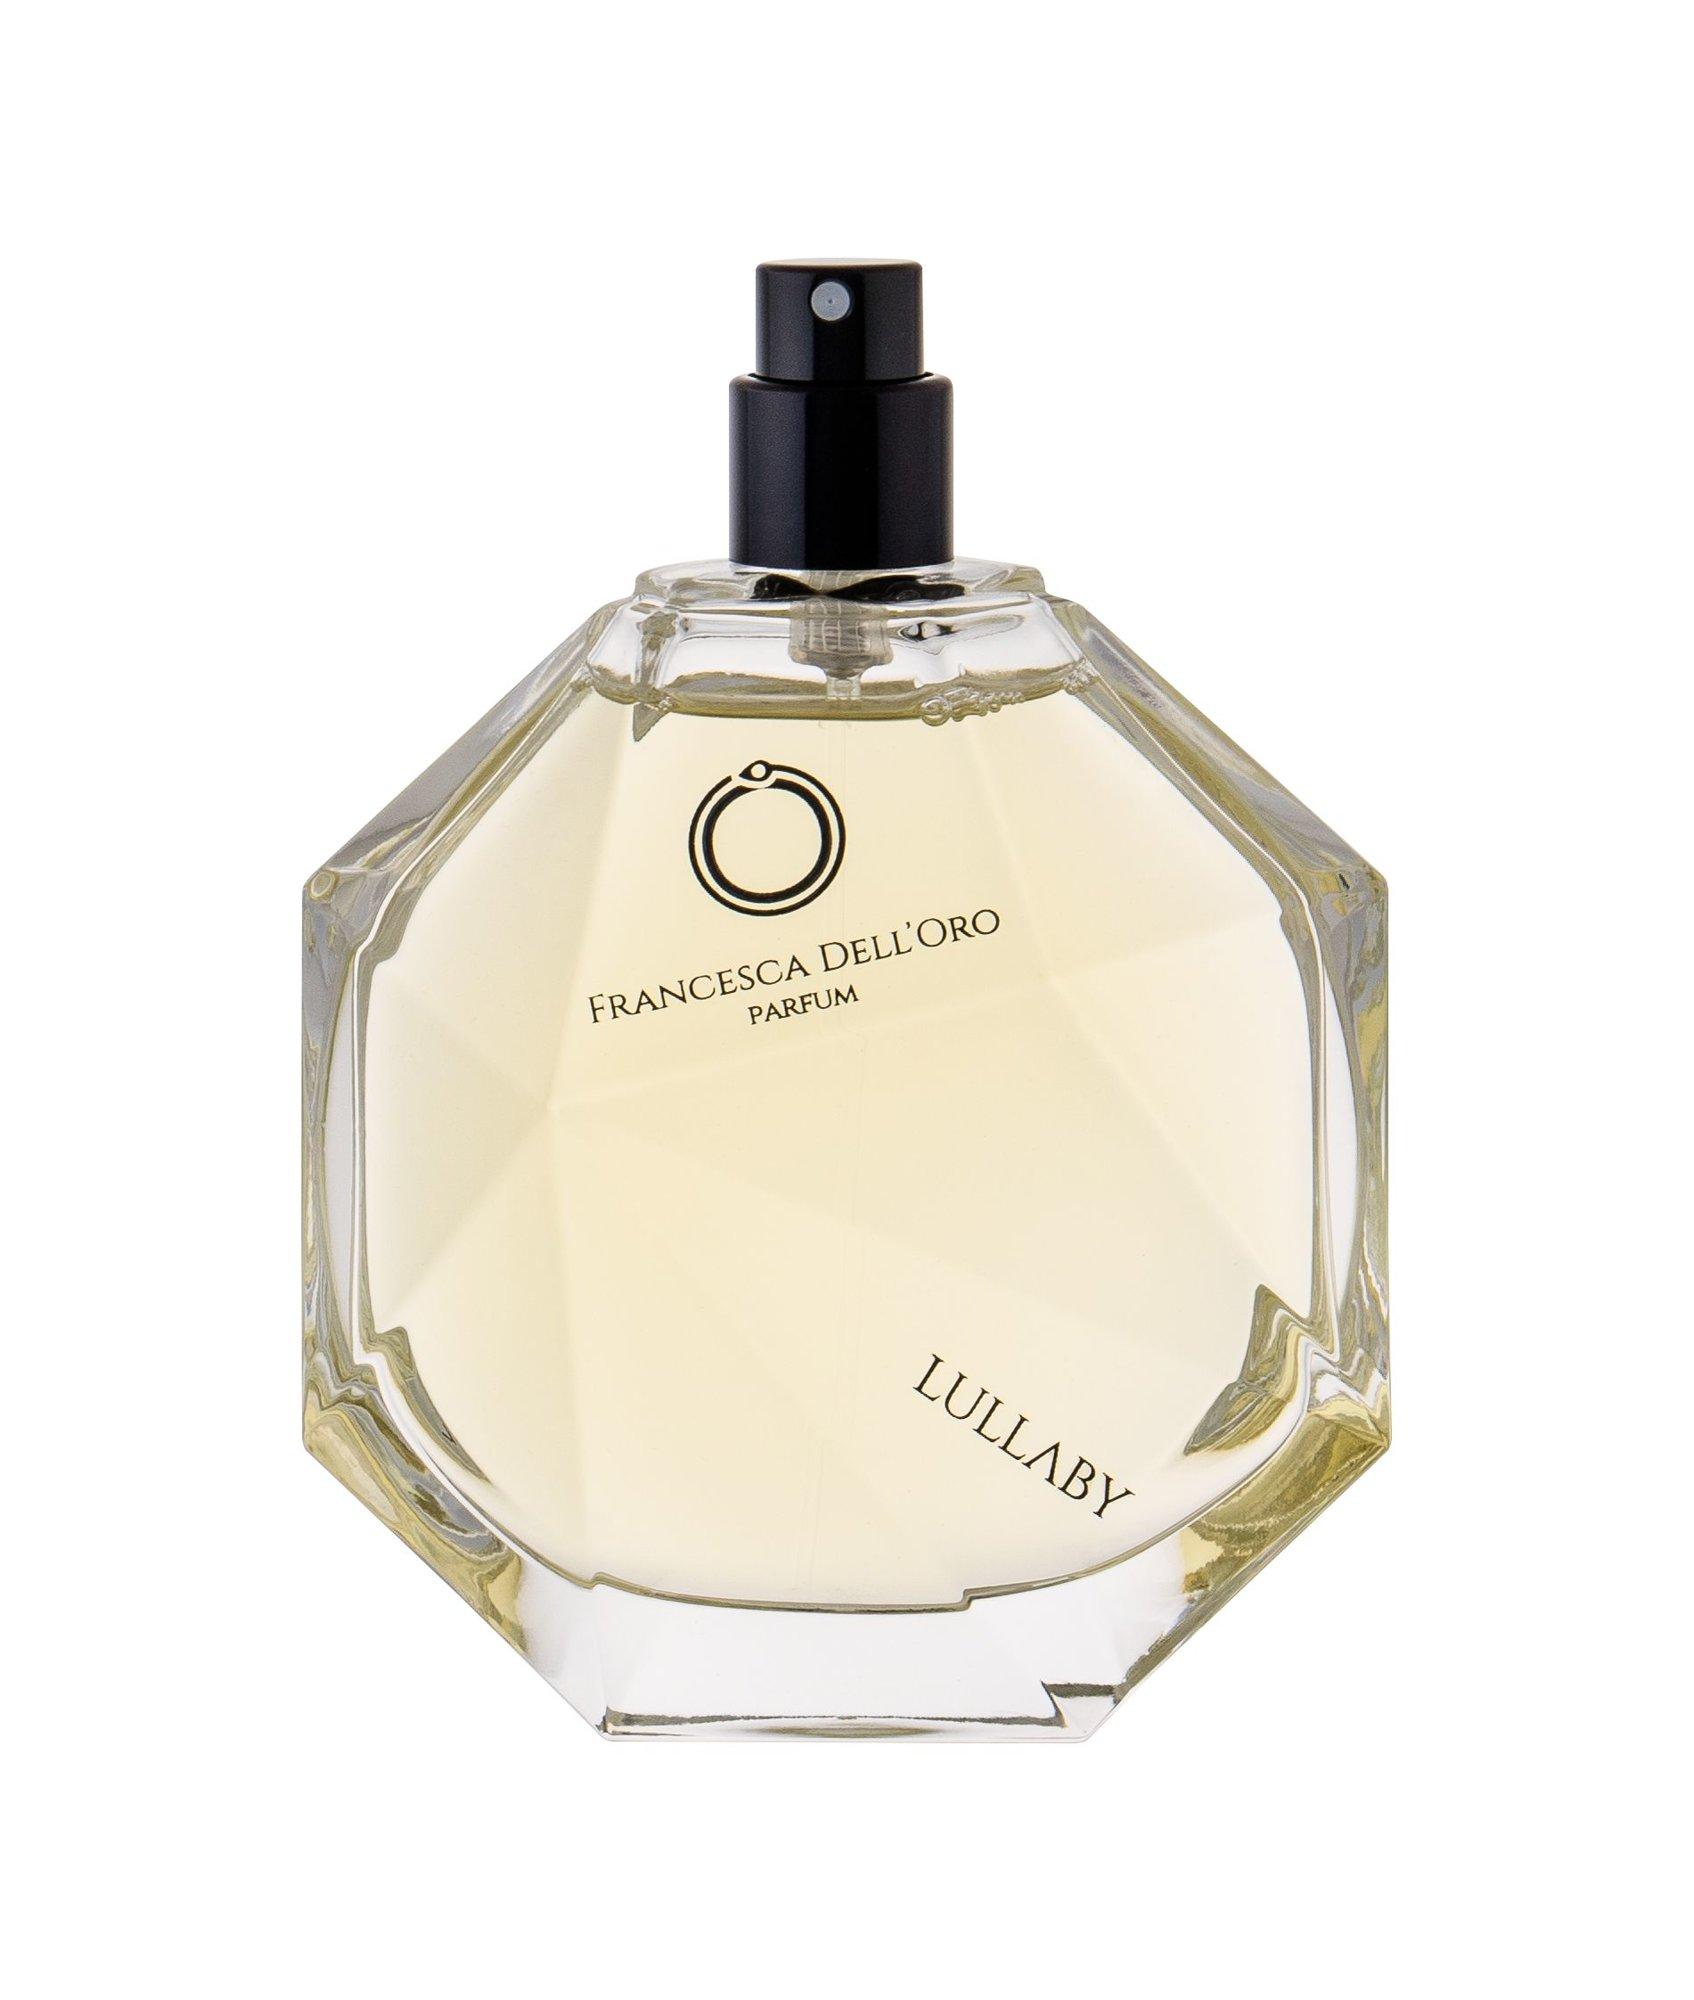 Francesca dell´Oro Lullaby Eau de Parfum 100ml